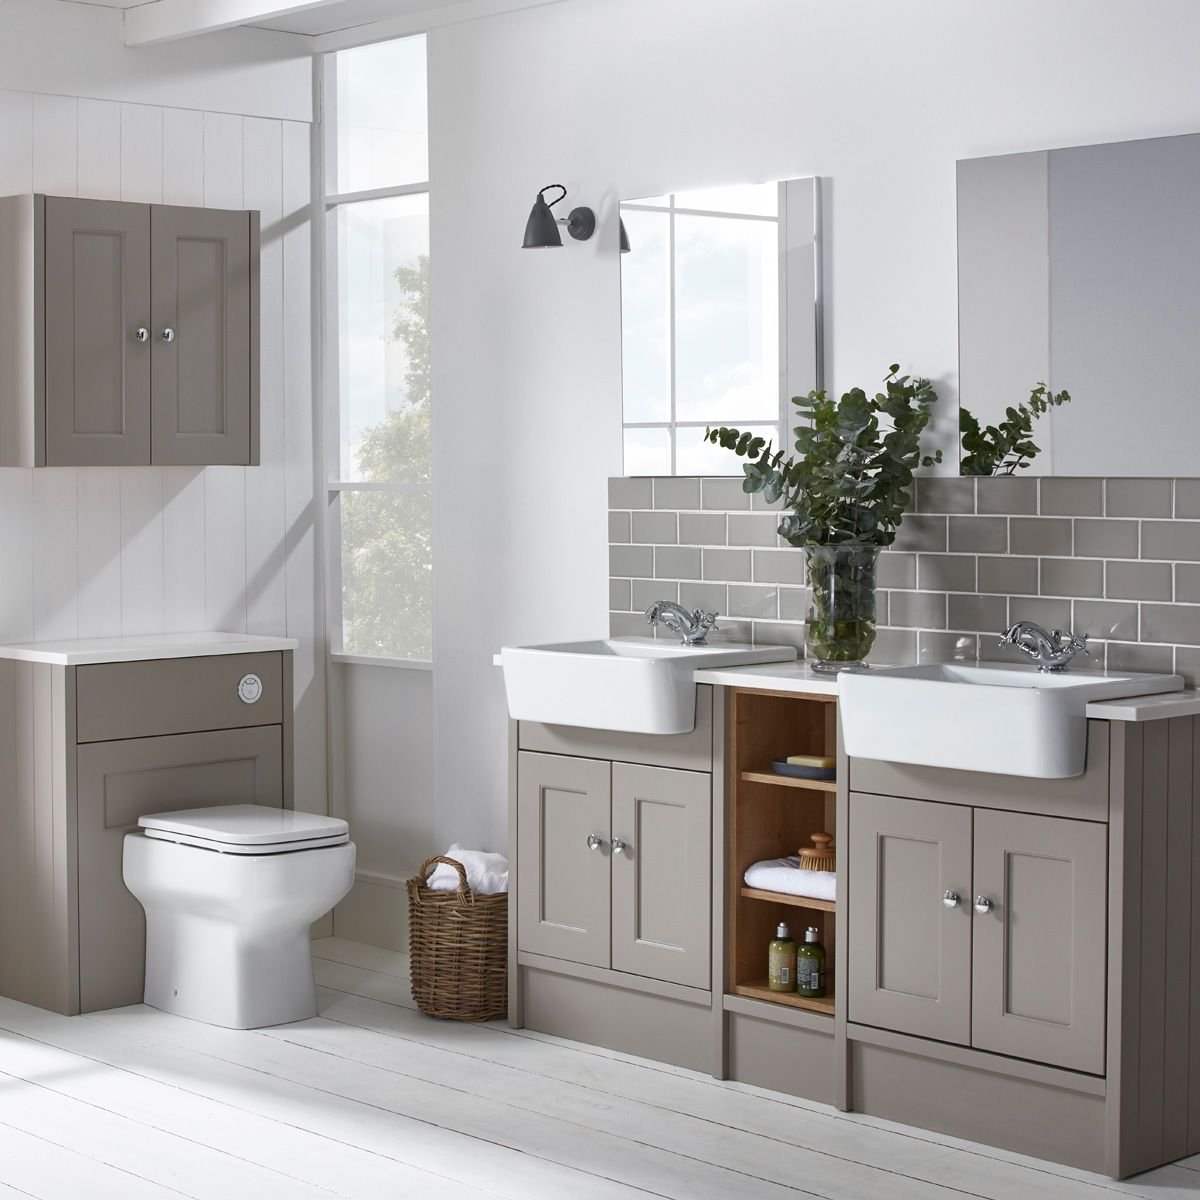 Roper rhodes burford mocha his and hers bathroom for Bathroom furniture ideas